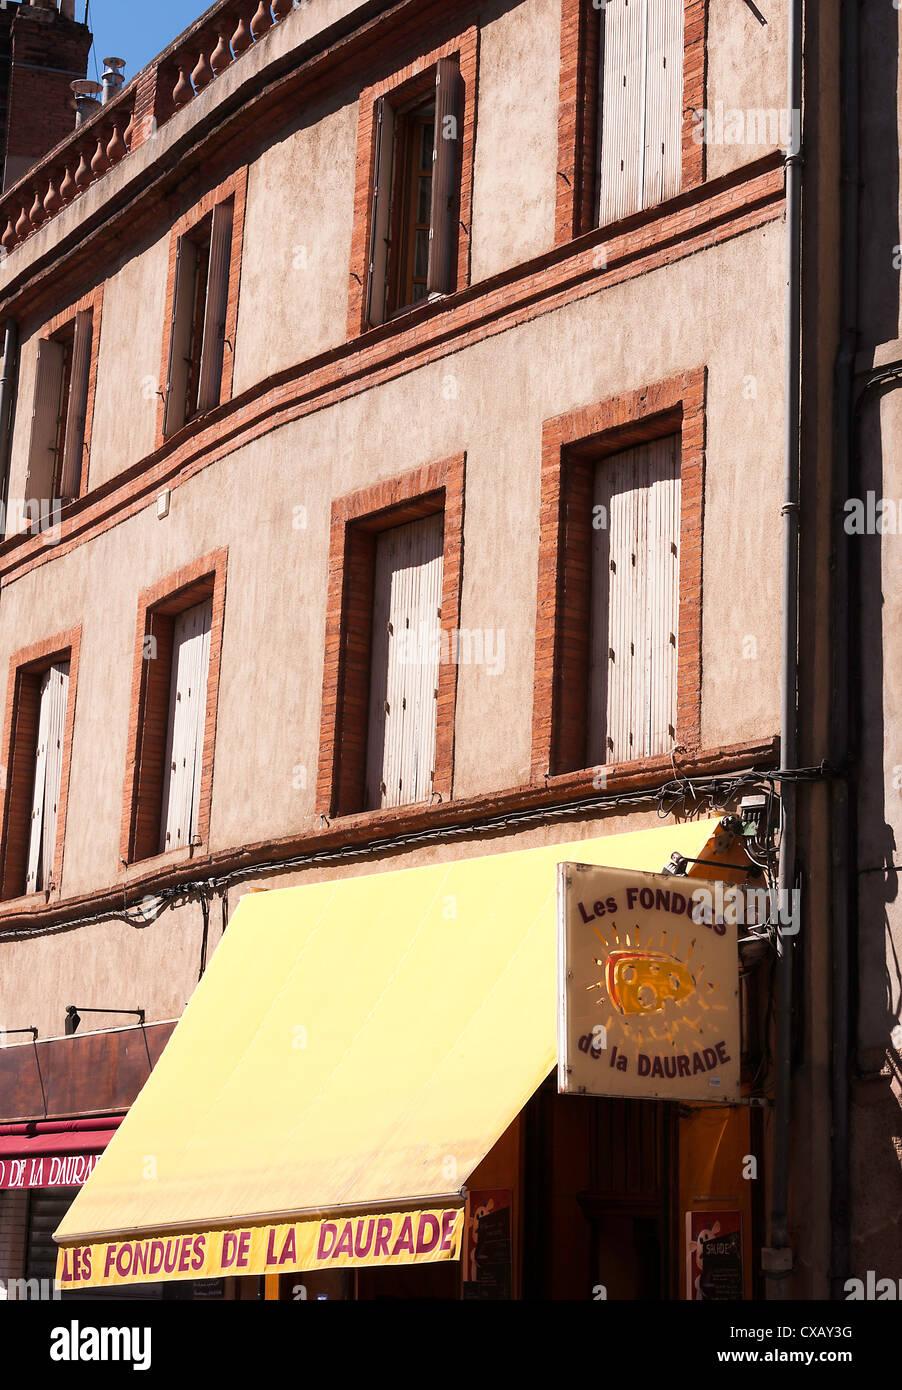 Les Fondues De La Daurade : fondues, daurade, Fondues, Resolution, Stock, Photography, Images, Alamy